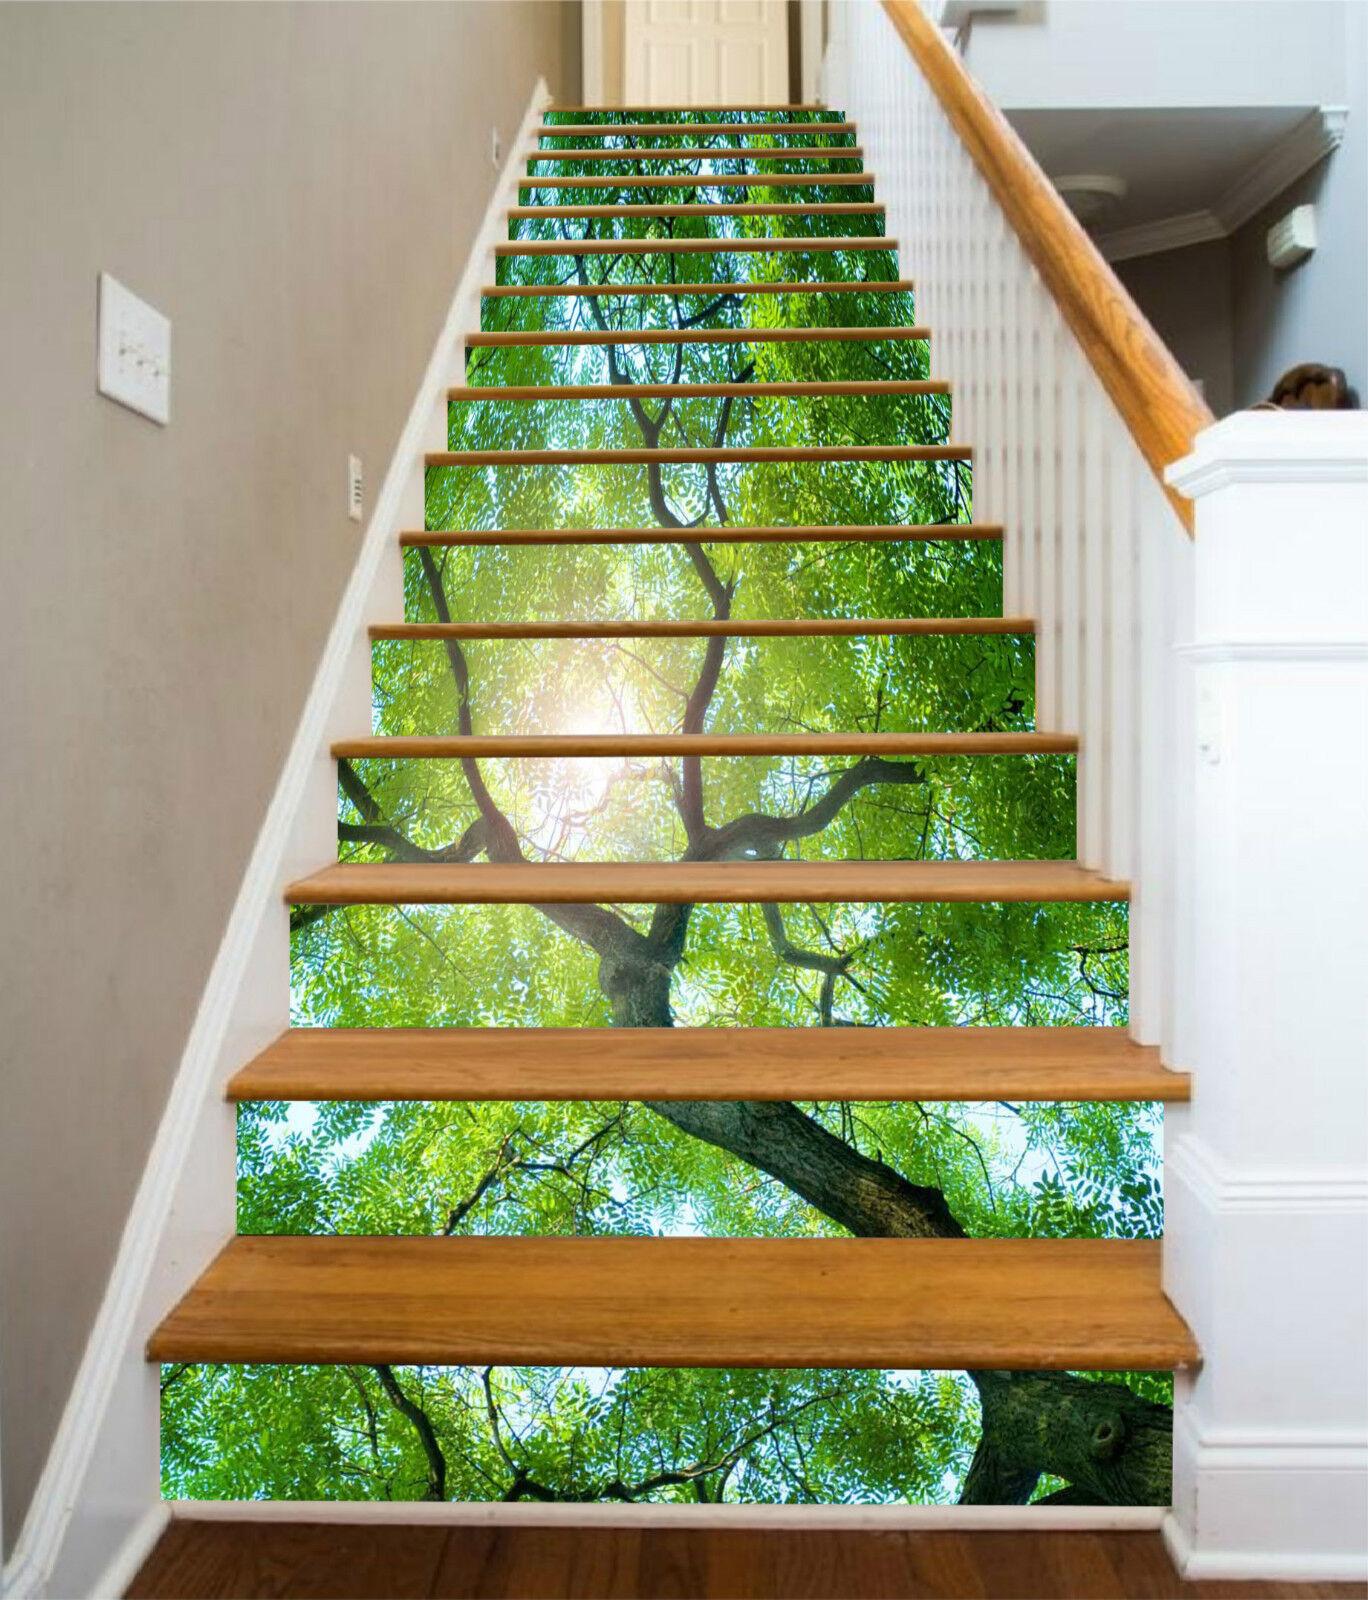 3D Grn Baum 855 Stair Risers Dekoration Fototapete Vinyl Aufkleber Tapete DE